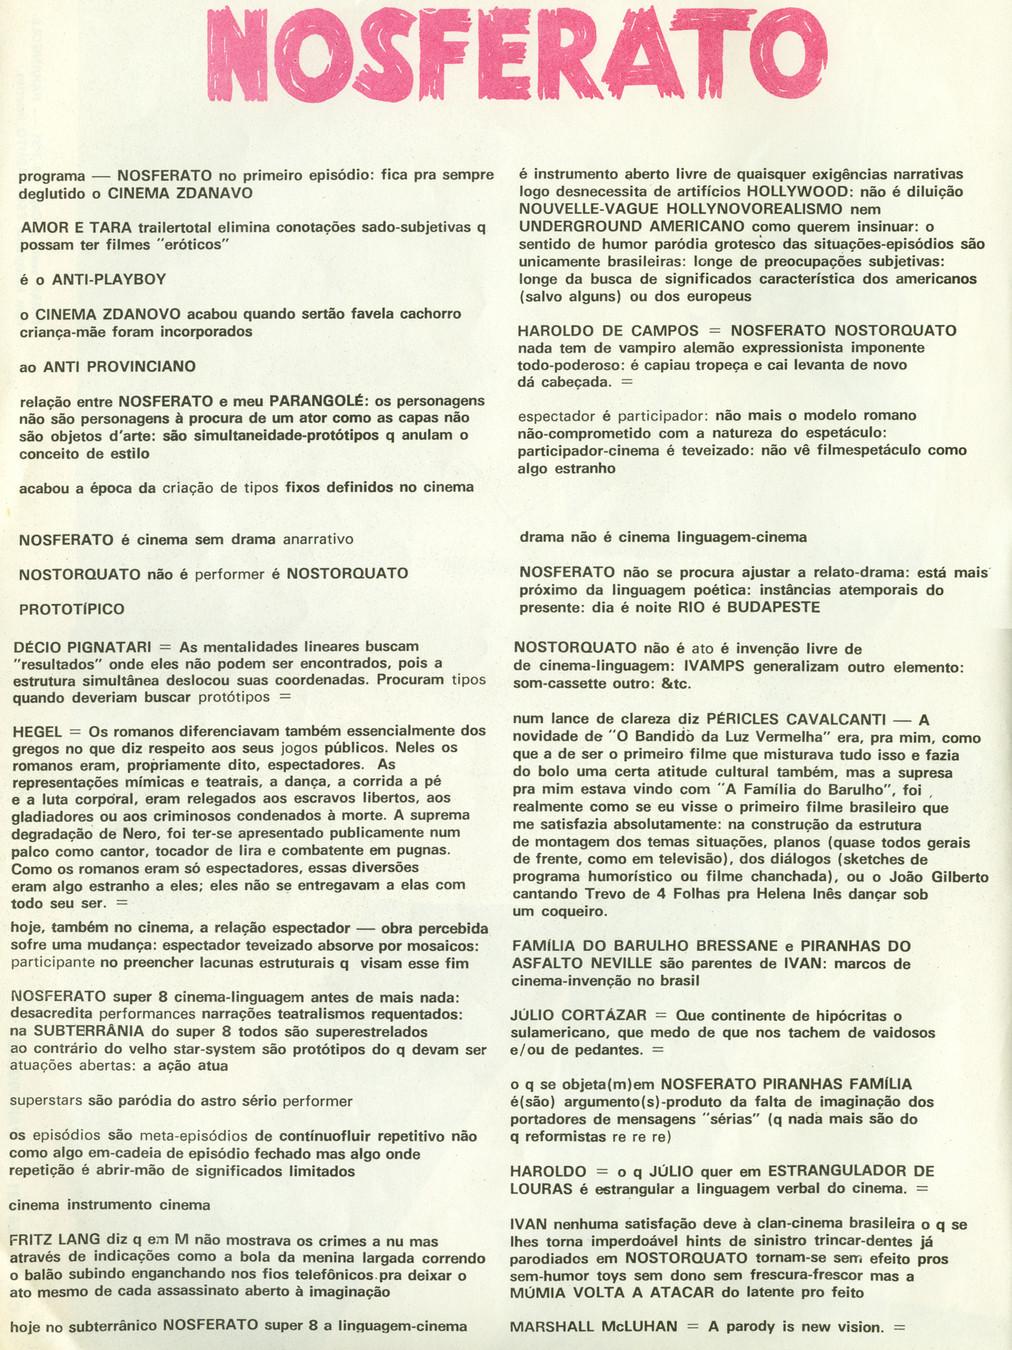 pag 41.jpg